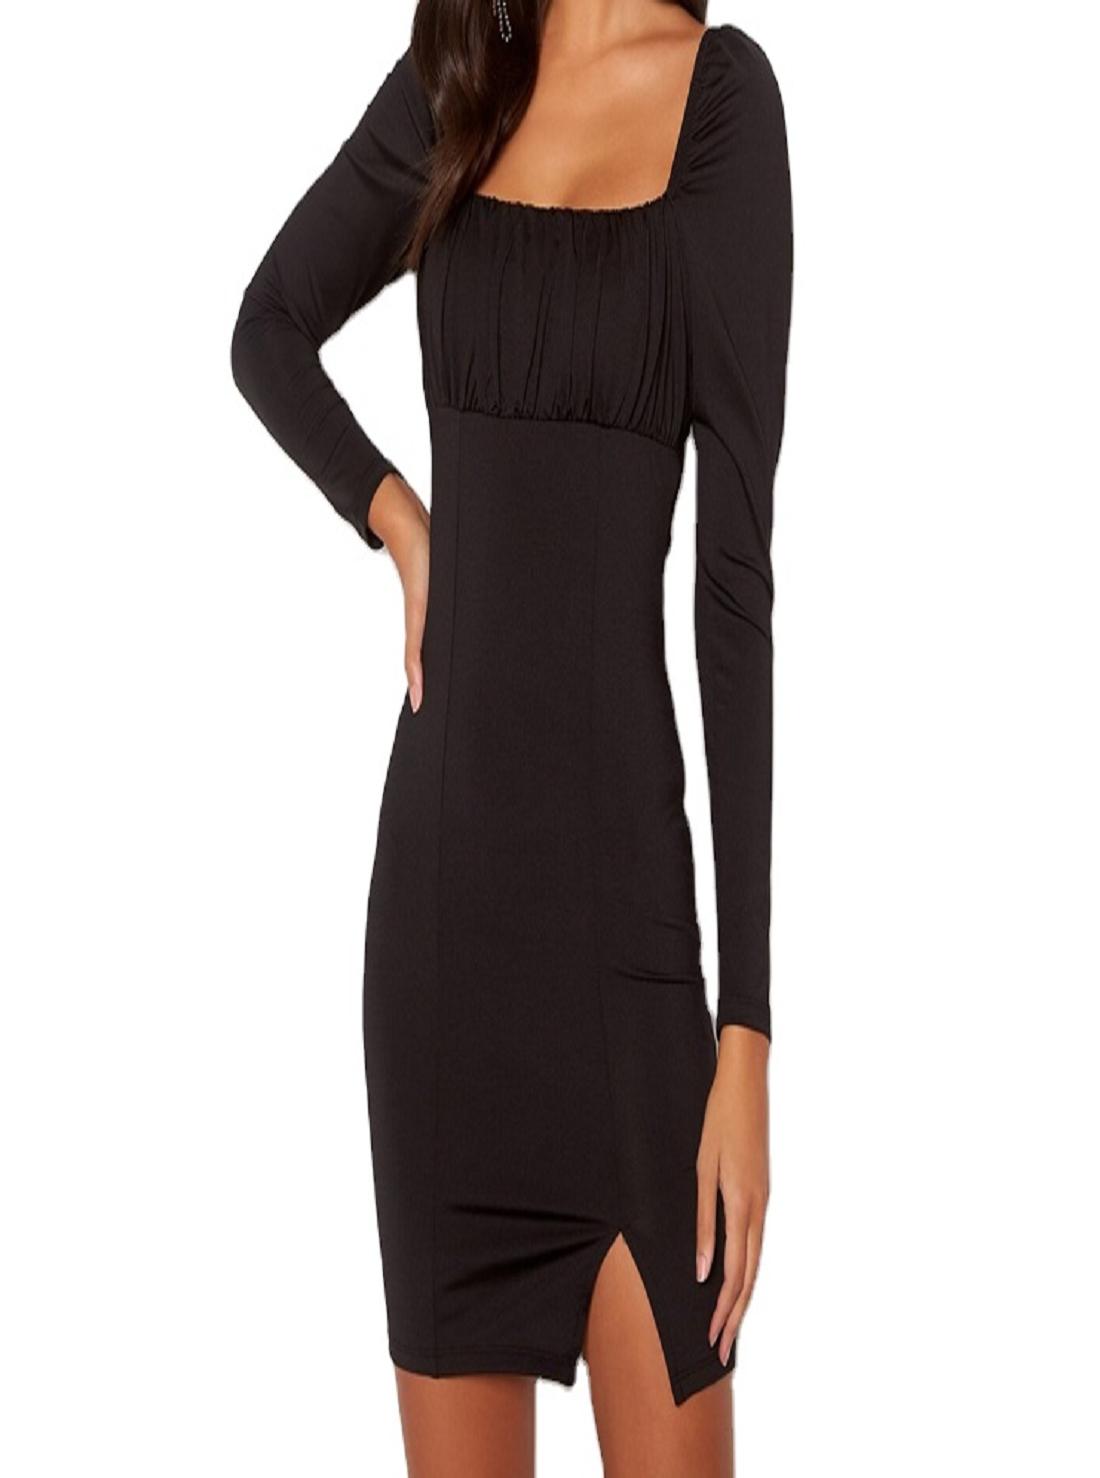 Wholesale Square-Neck Black Dress